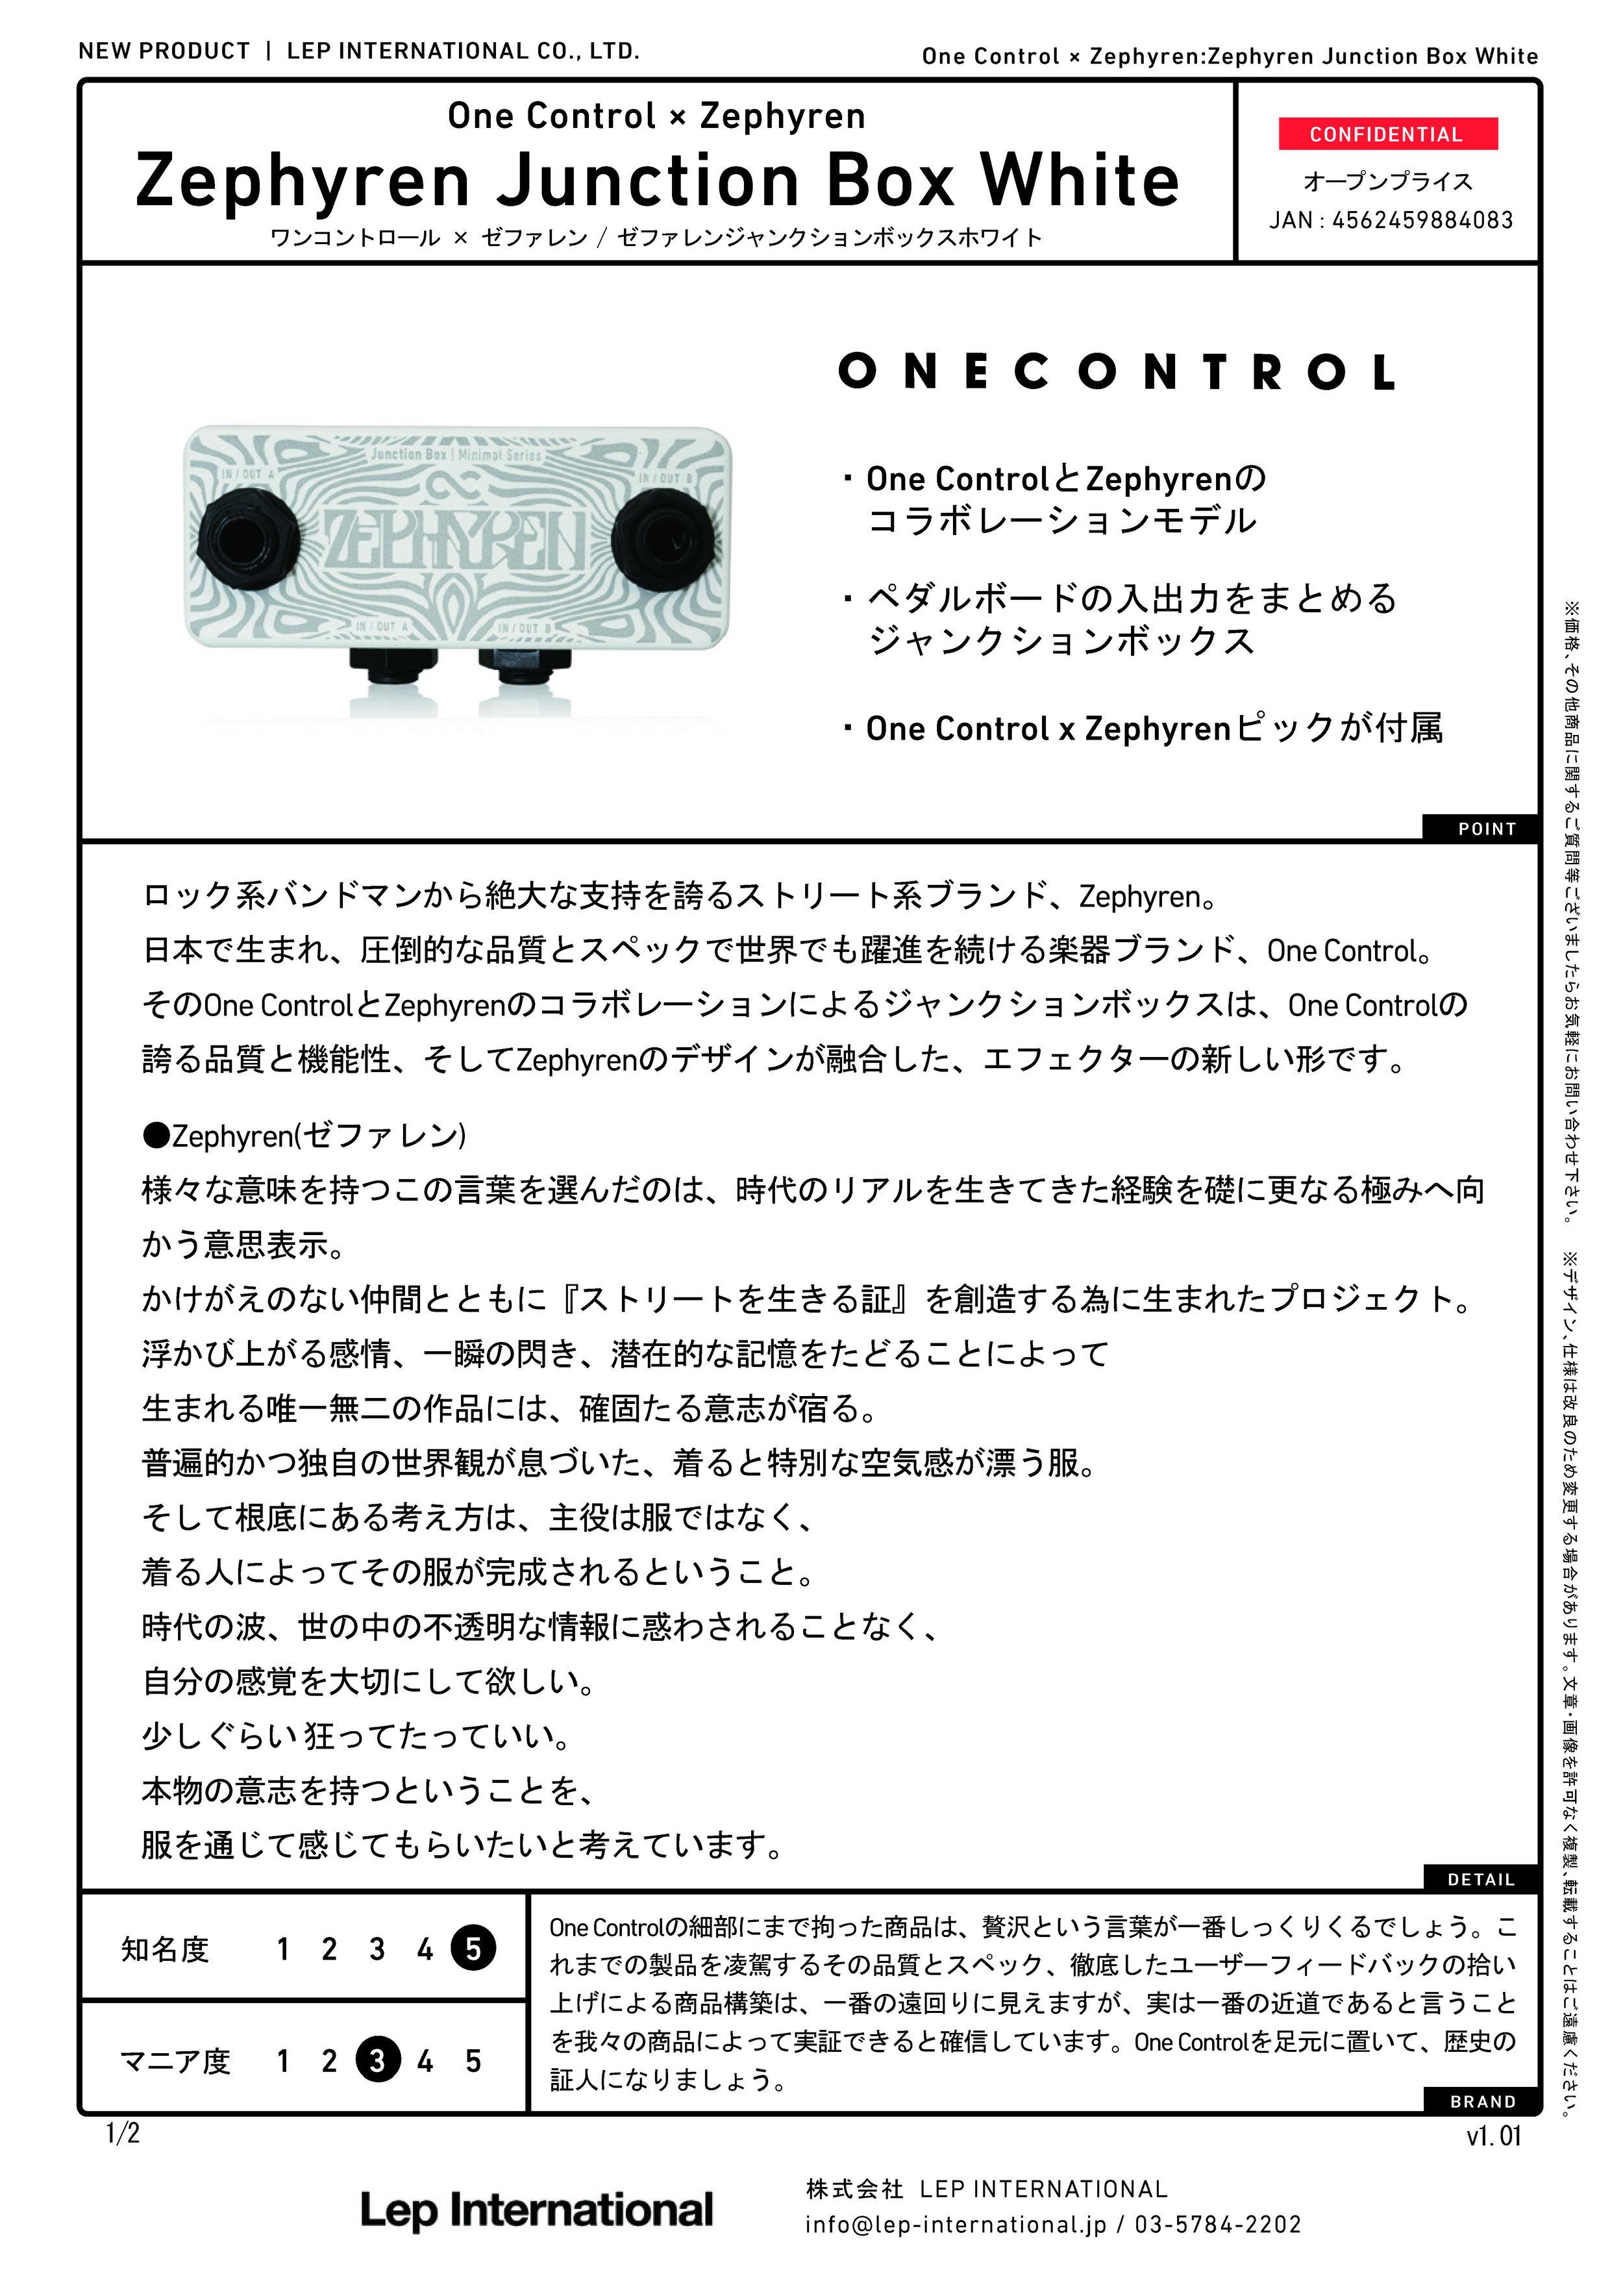 onecontrol zephyren Zephyrenjunctionboxwhite v1.01_ページ_1.jpg